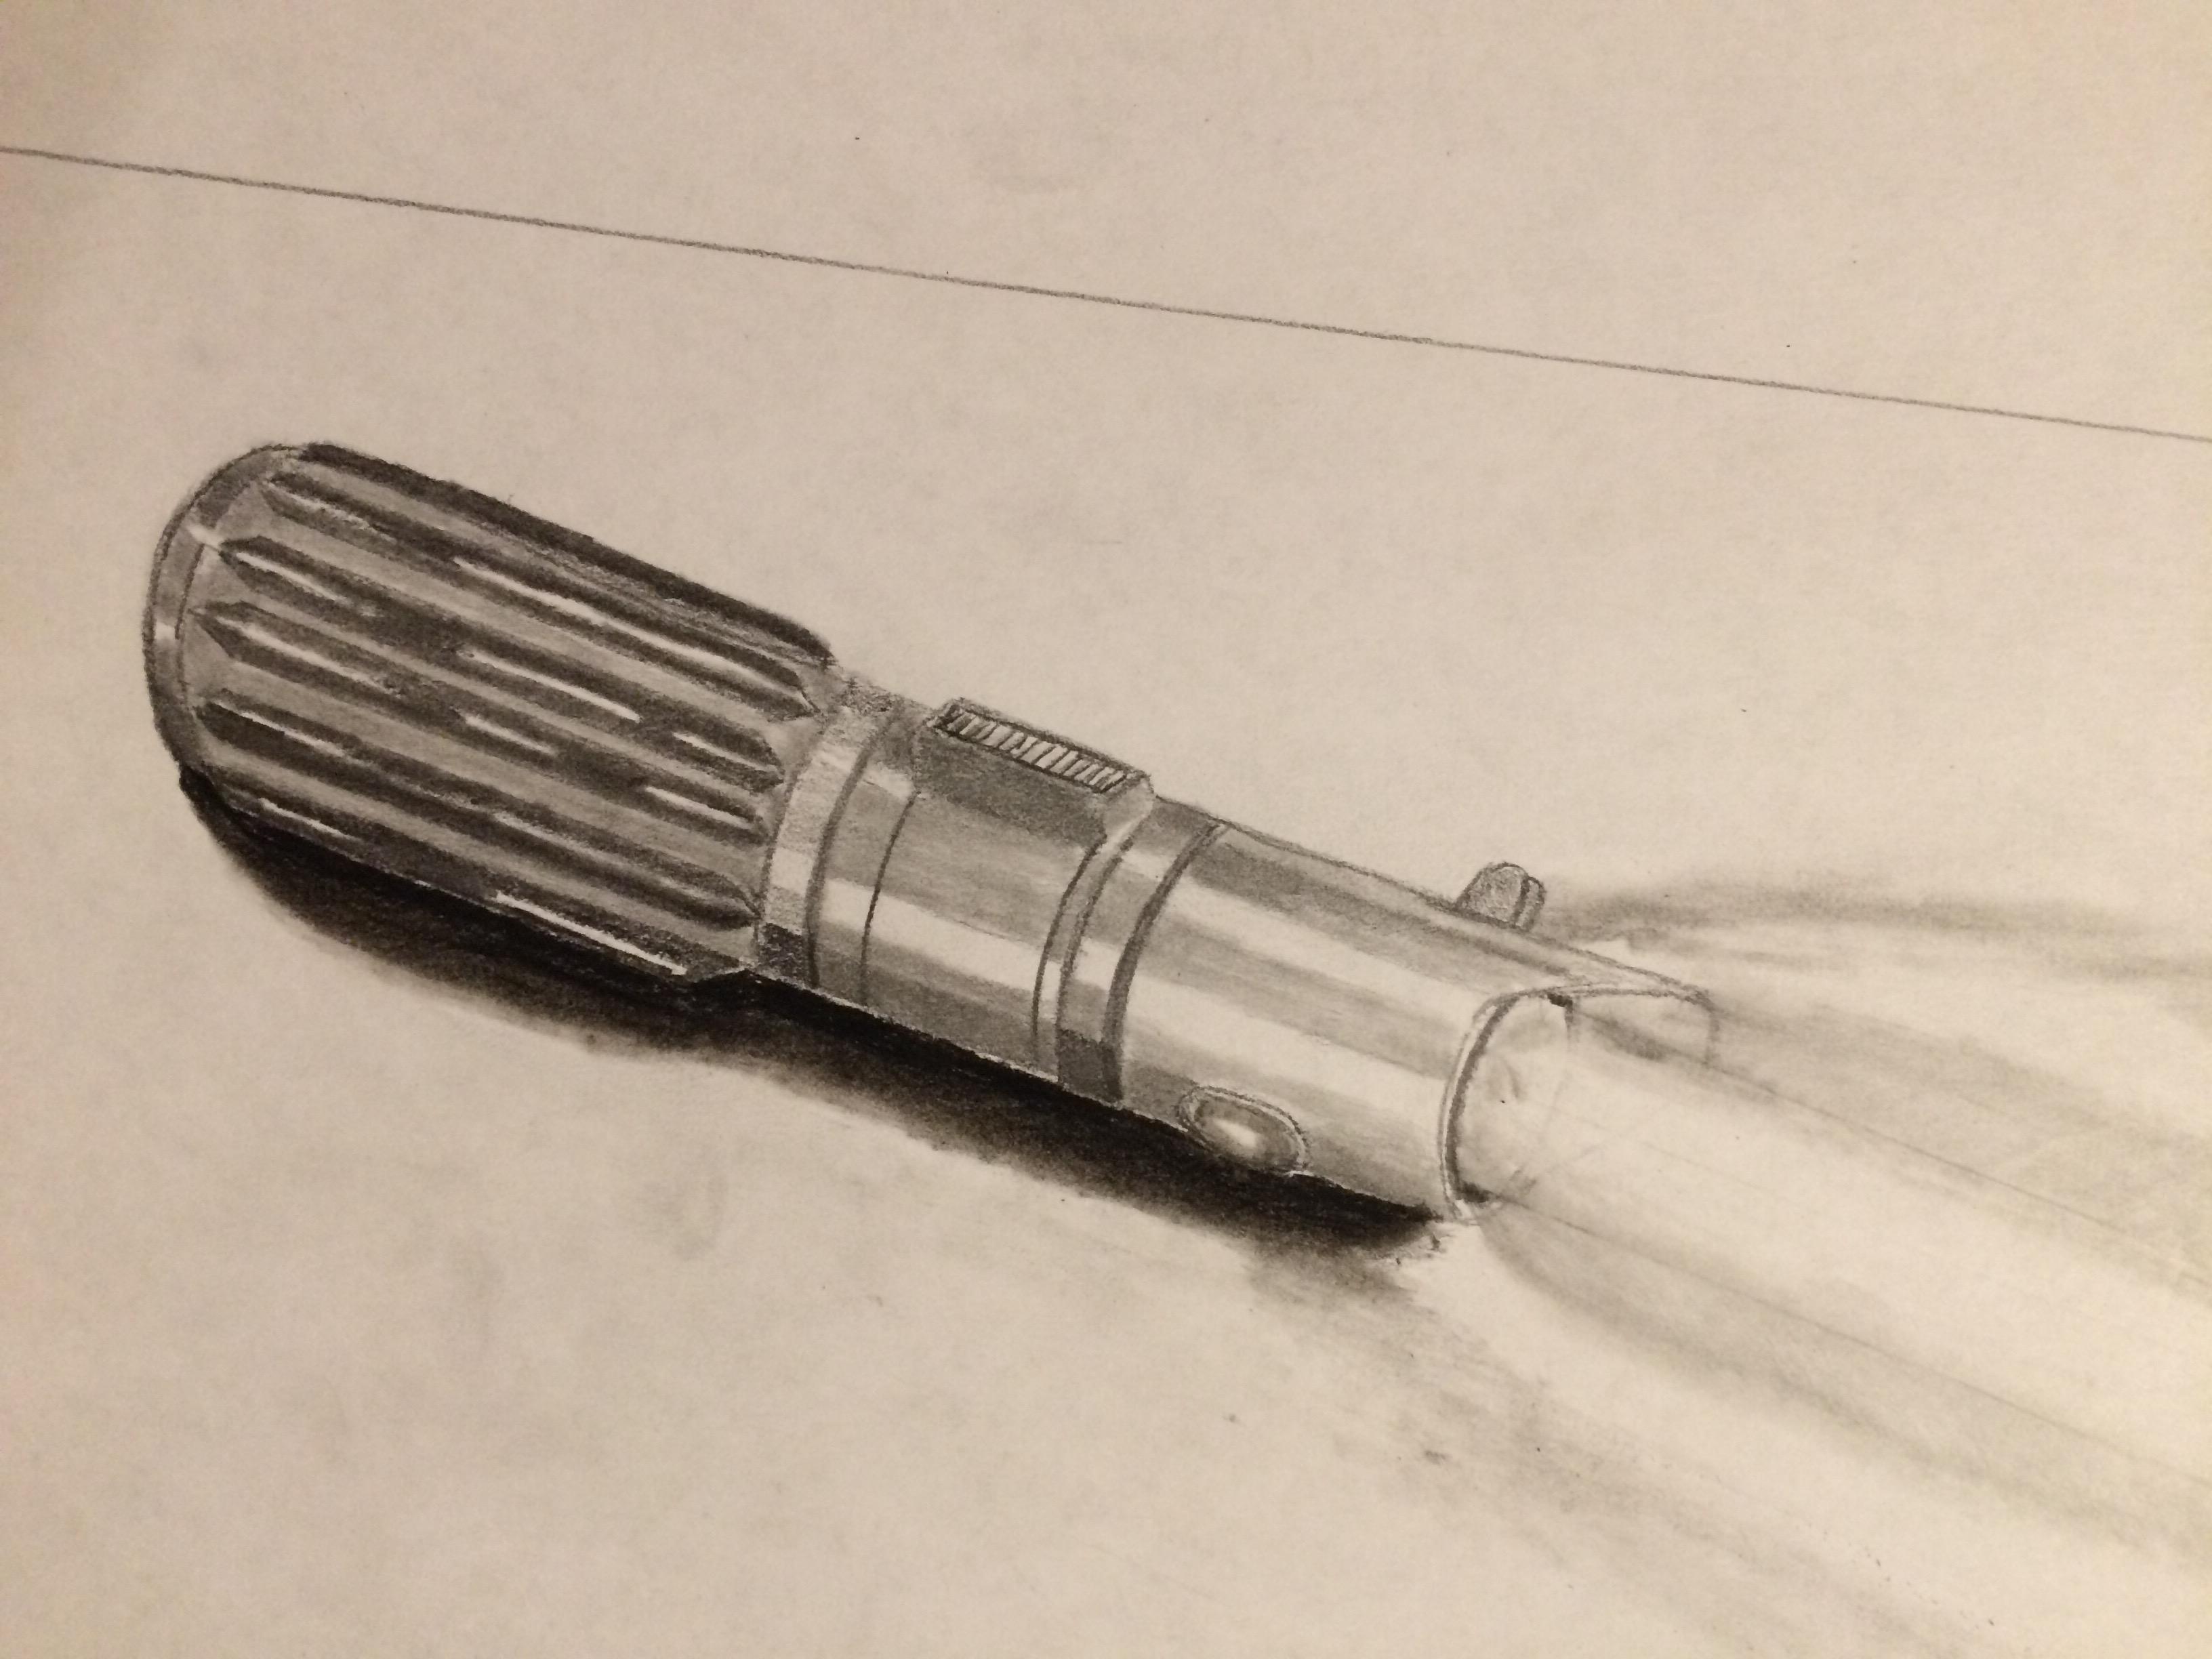 Pencil Lightsaber